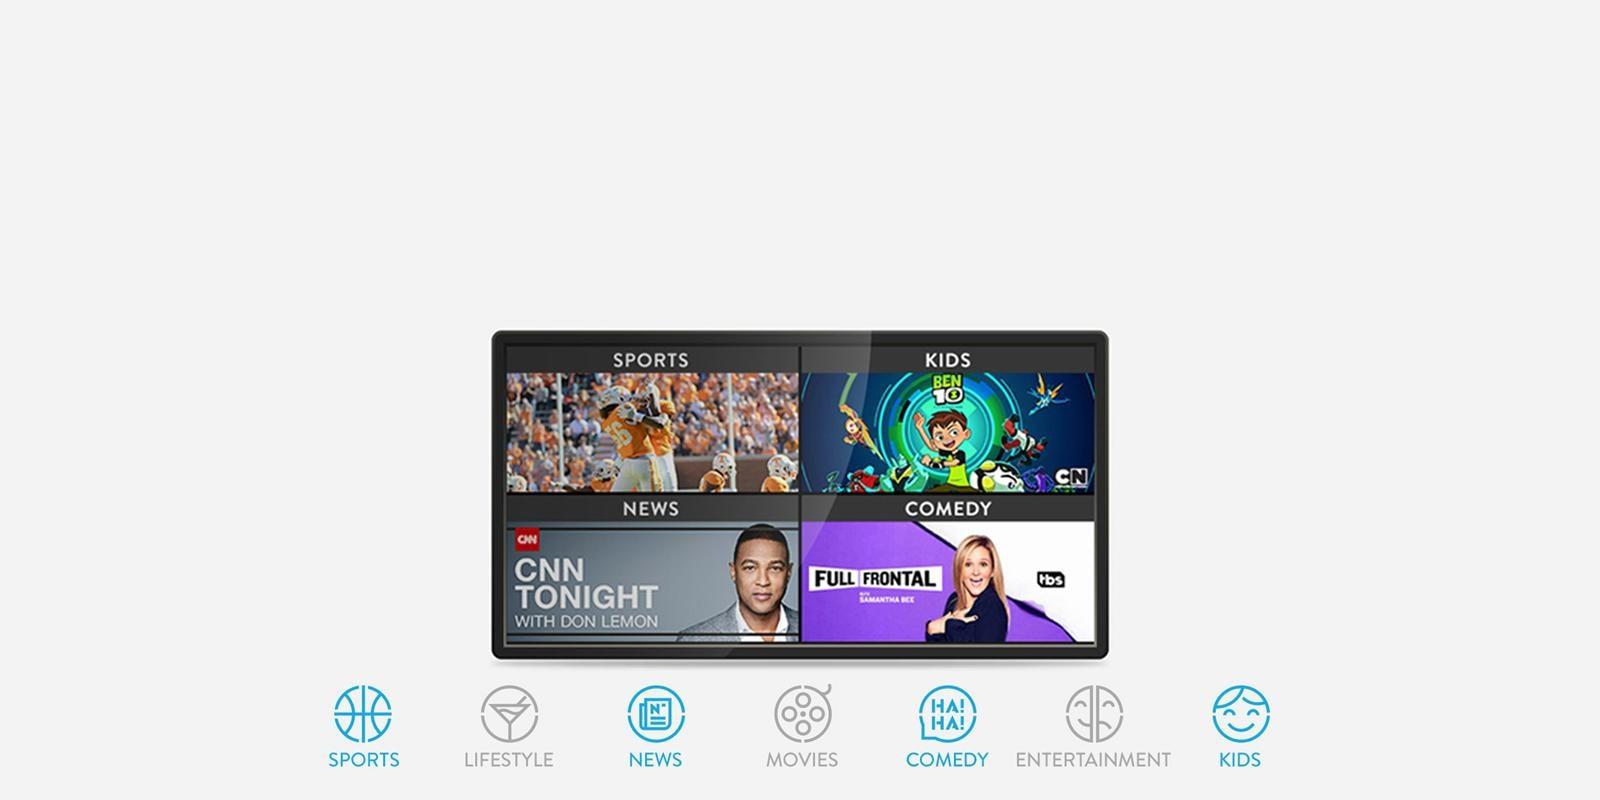 LG UJ Inch K UHD HDR Smart LED TV LG USA - Us zip code tv provider